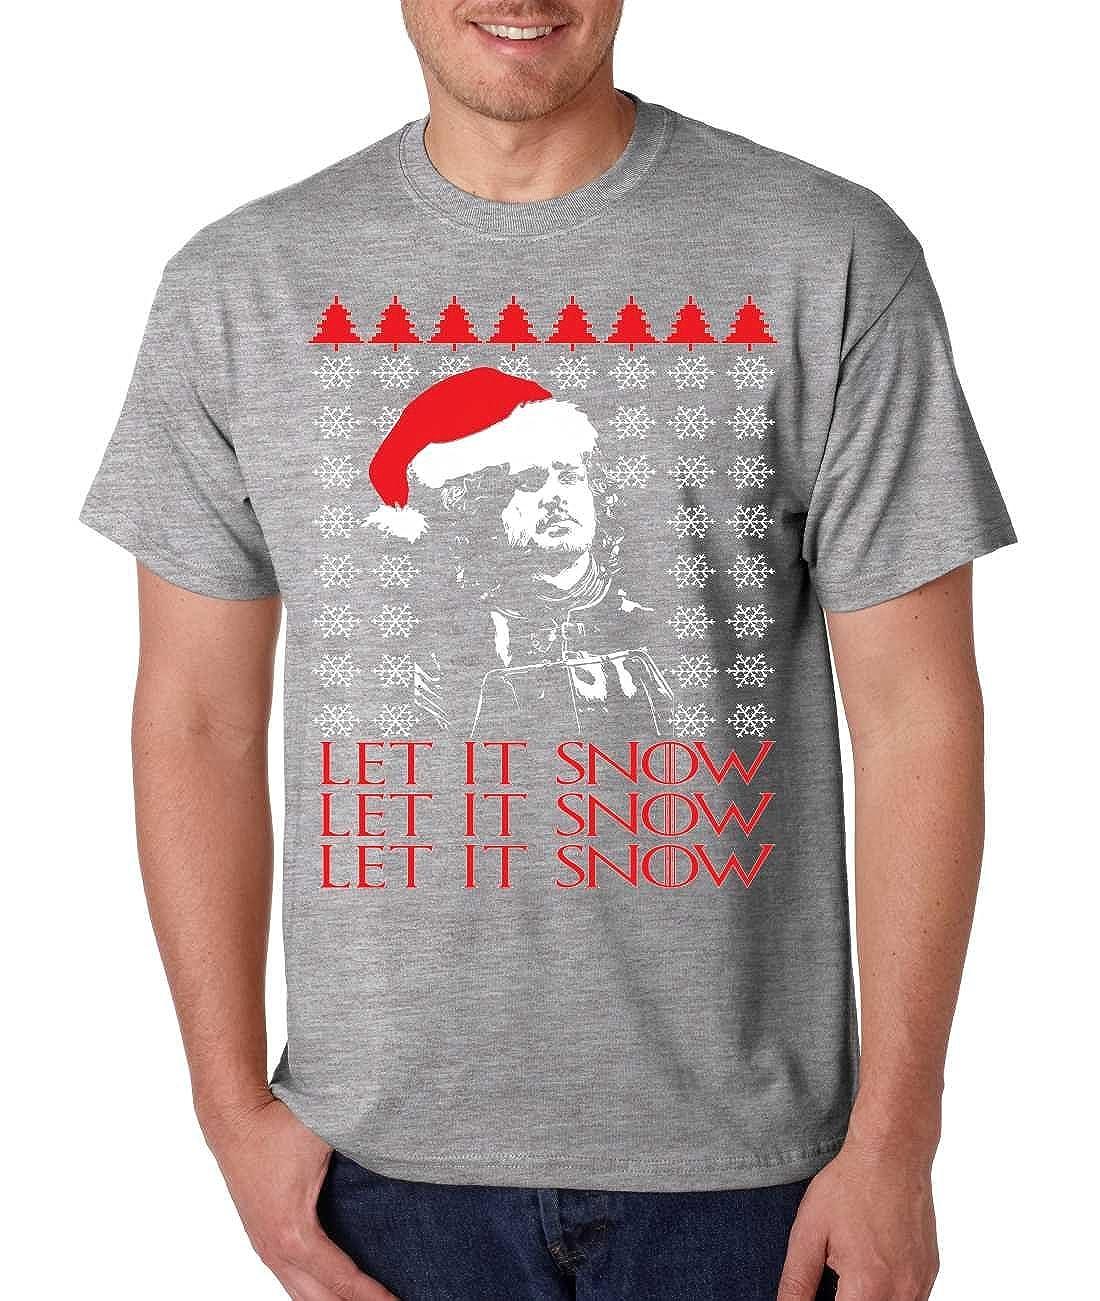 allntrends mens shirt let it snow ugly christmas sweater jon snow gift clothing jpg 1100x1301 jon